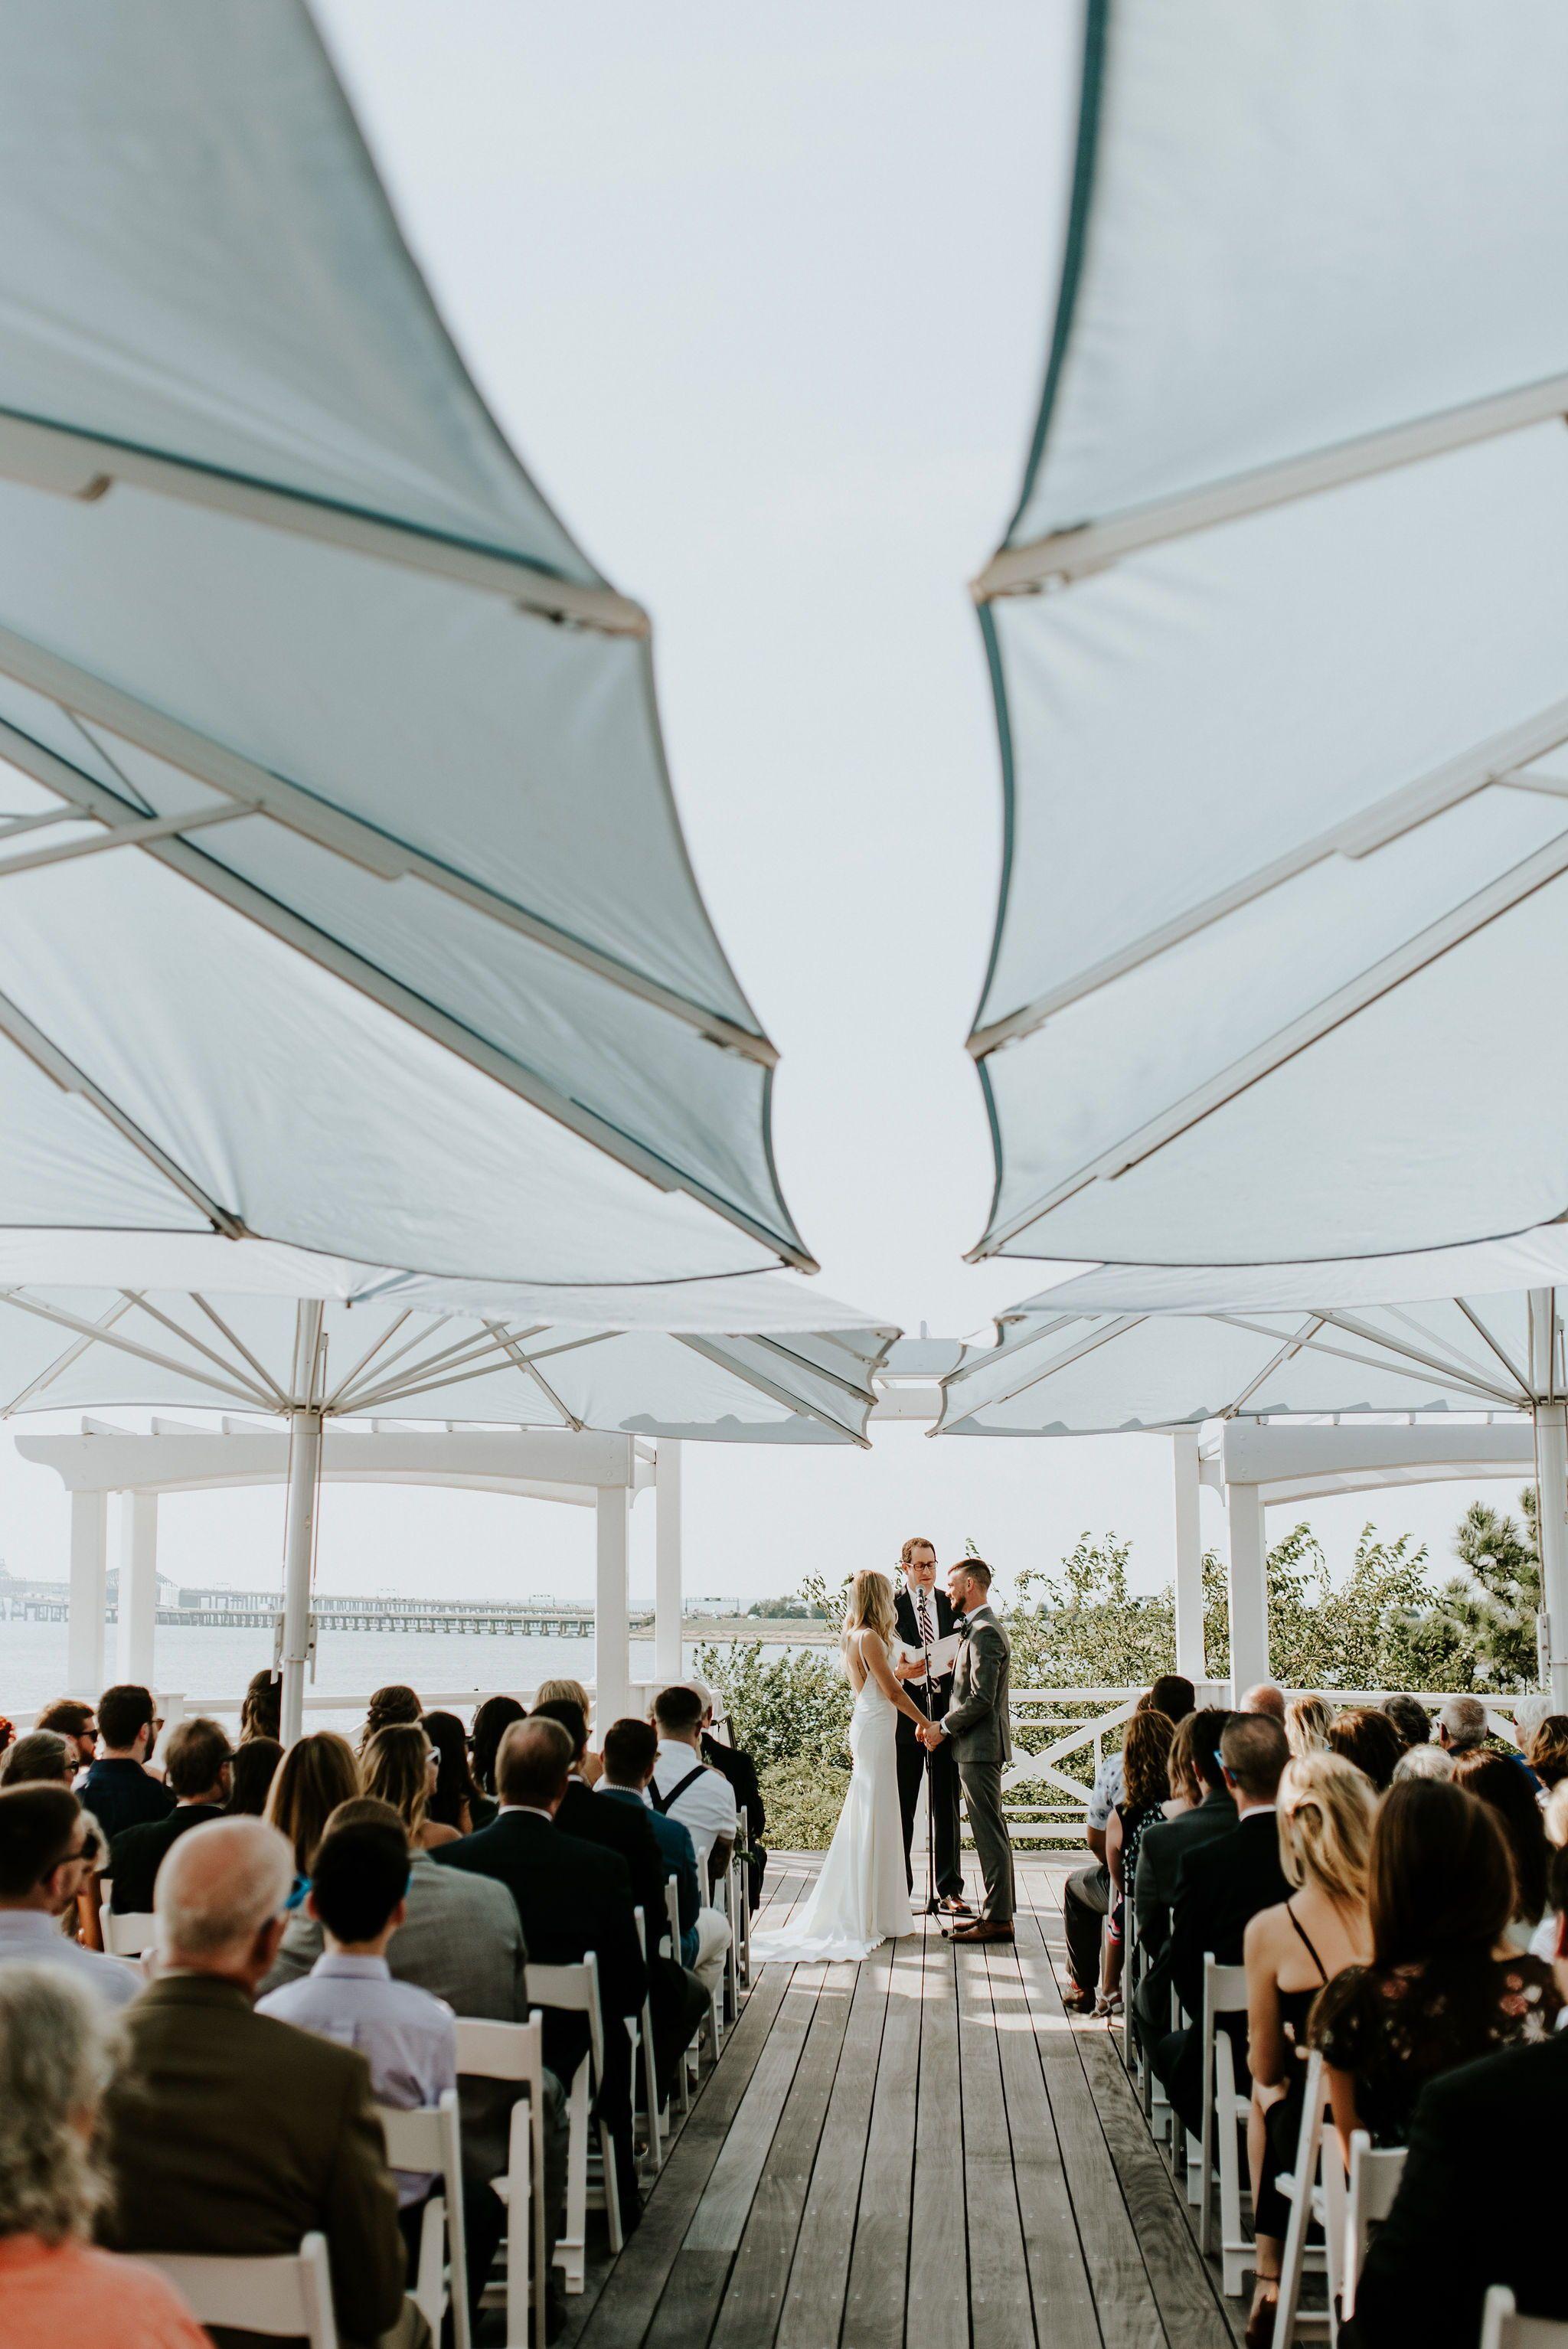 Chesapeake Bay Beach Club Cbbc Maryland Eastern Shore Wedding Venue Waterfront Beach Maryland Wedding Venues Eastern Shore Wedding Waterfront Wedding Venue